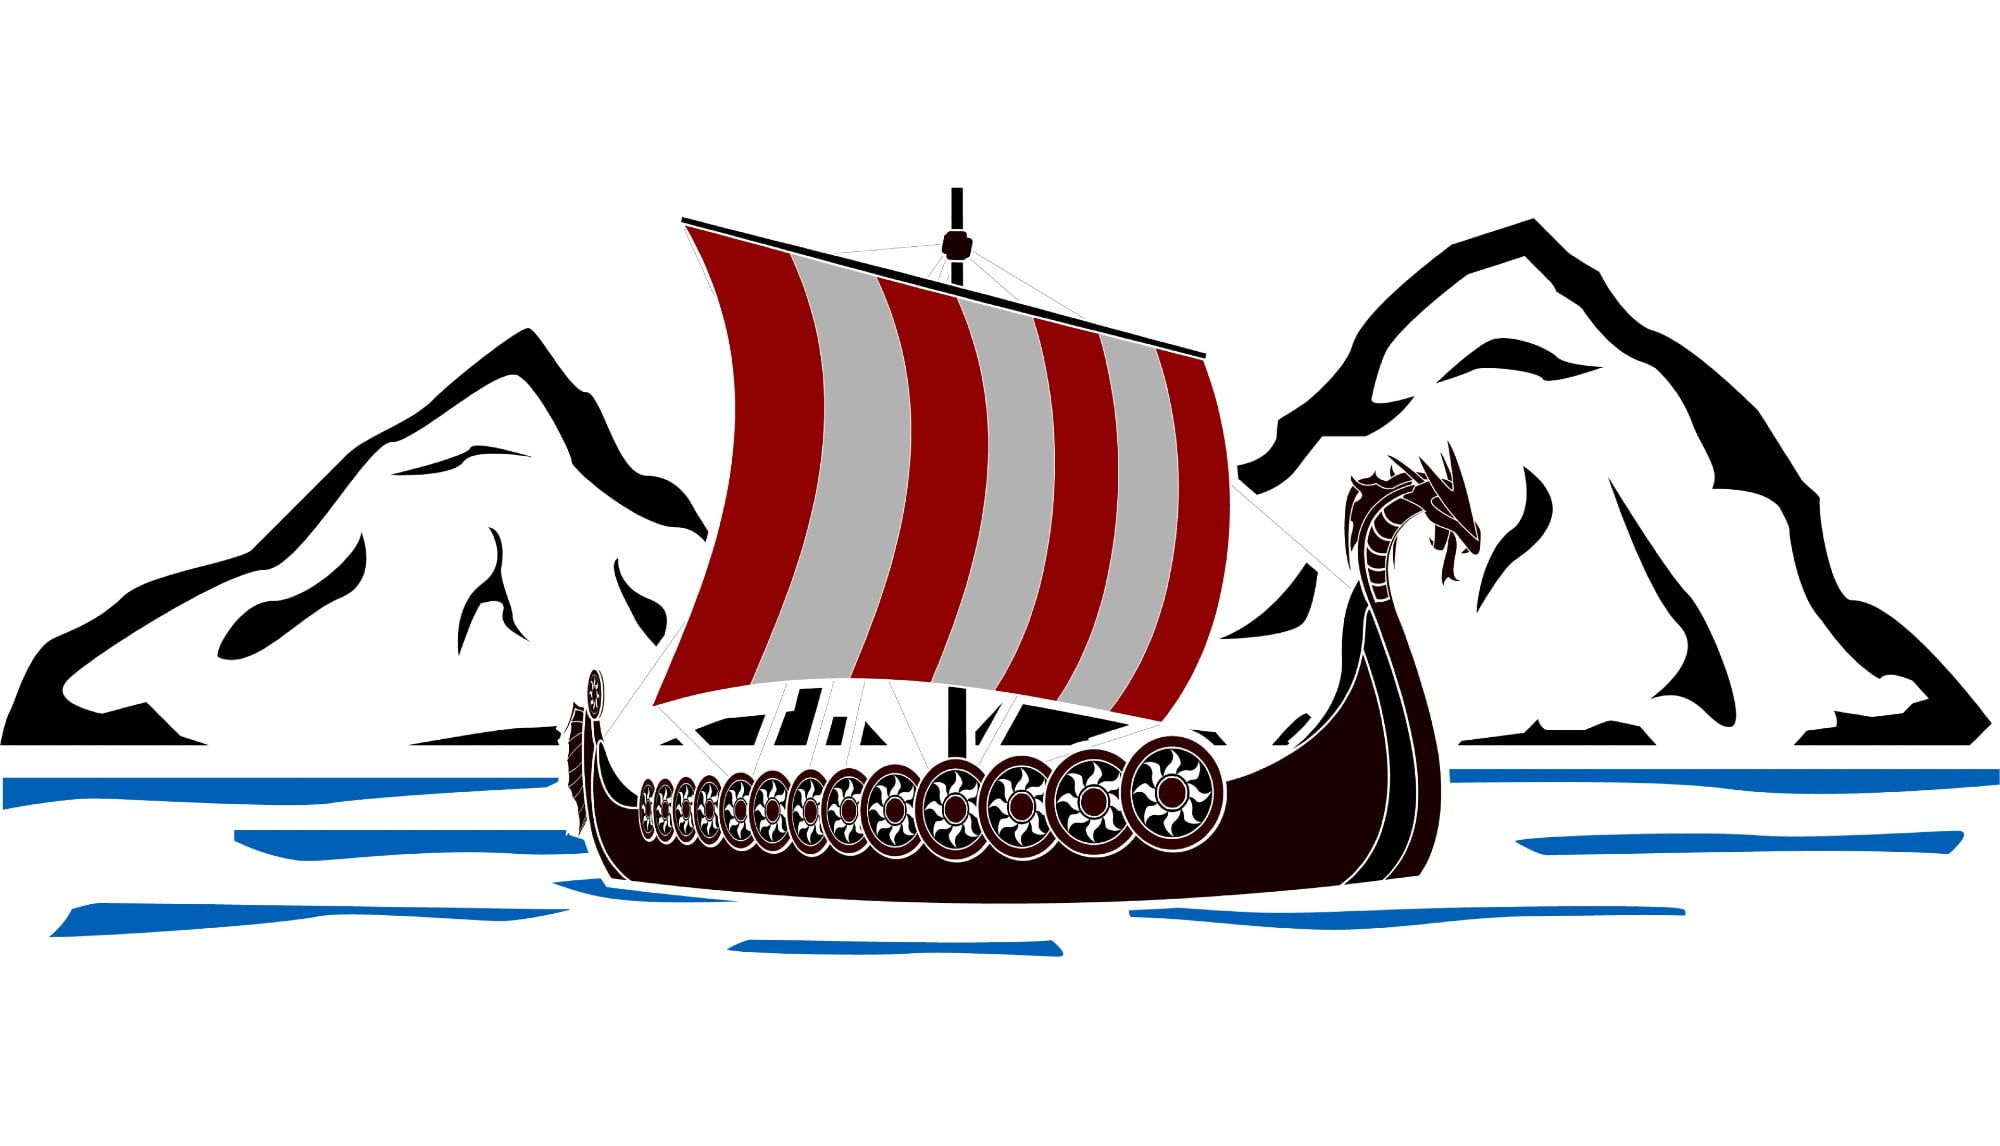 Norwegian history timeline of the Vikings